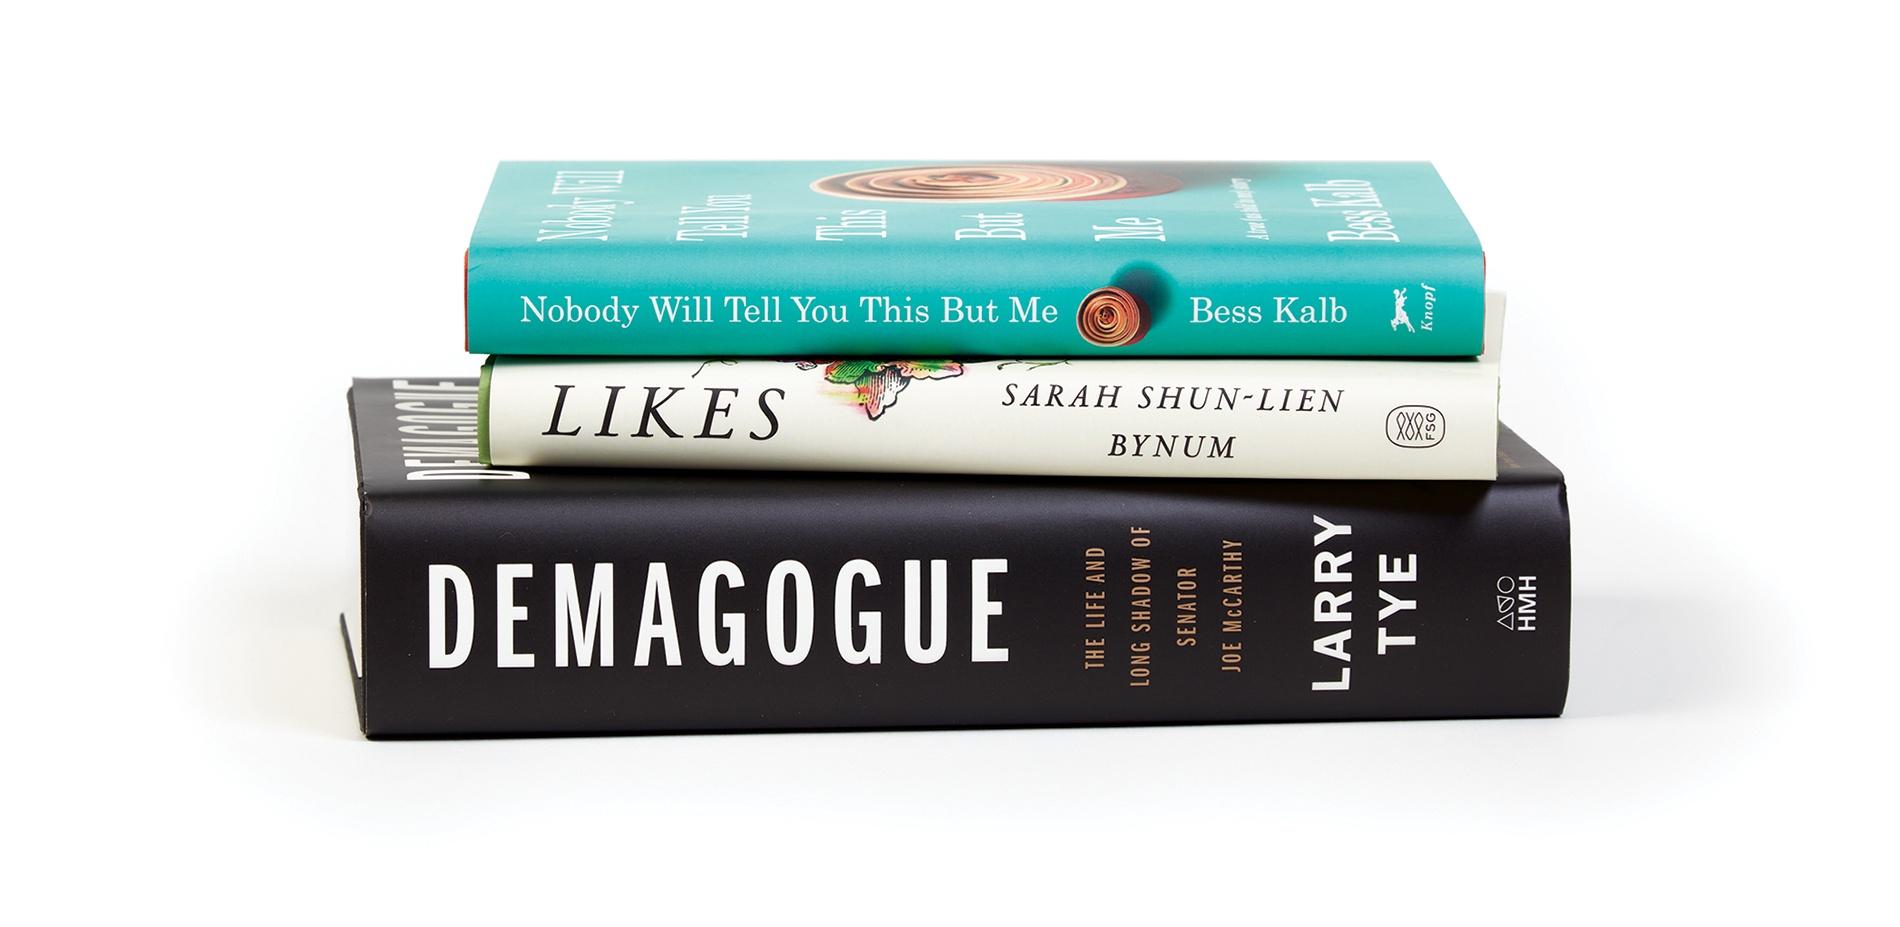 Books by Bess Kalb '10, Sarah Shun-lien Bynum '95, and Larry Tye '77